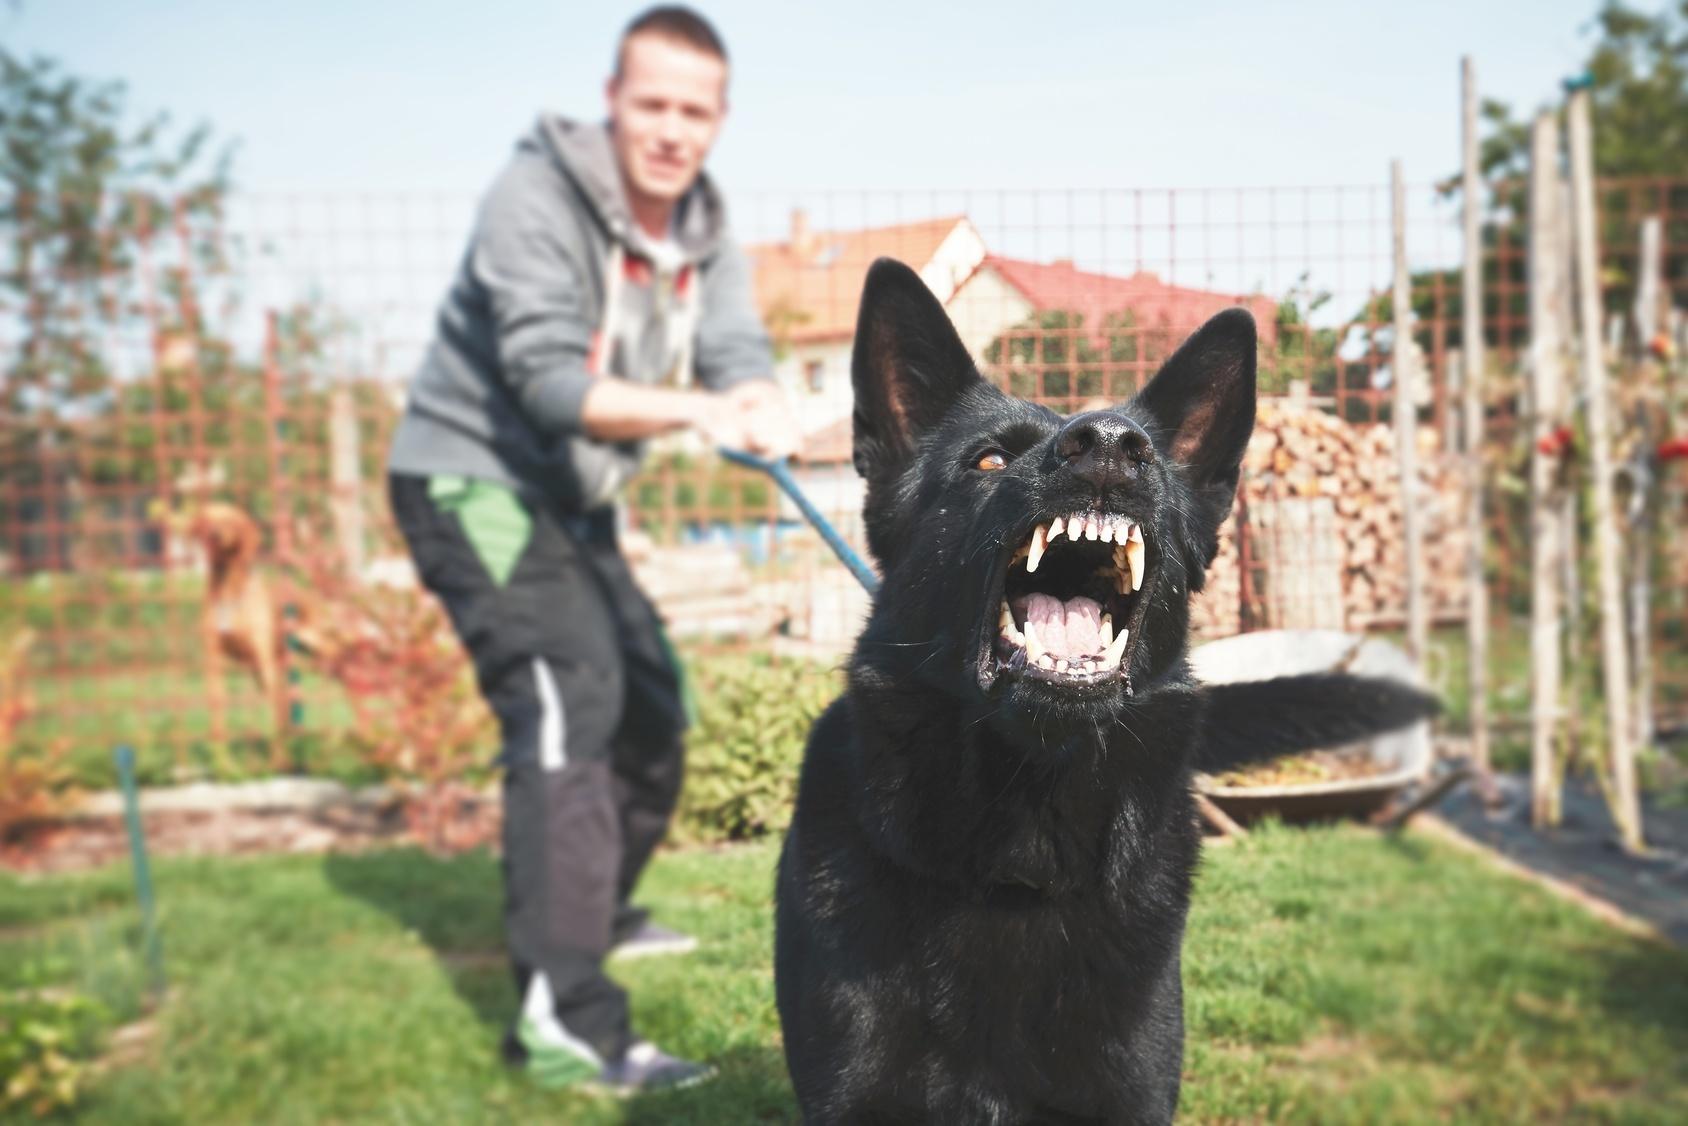 Man holding aggressive dog back on leash